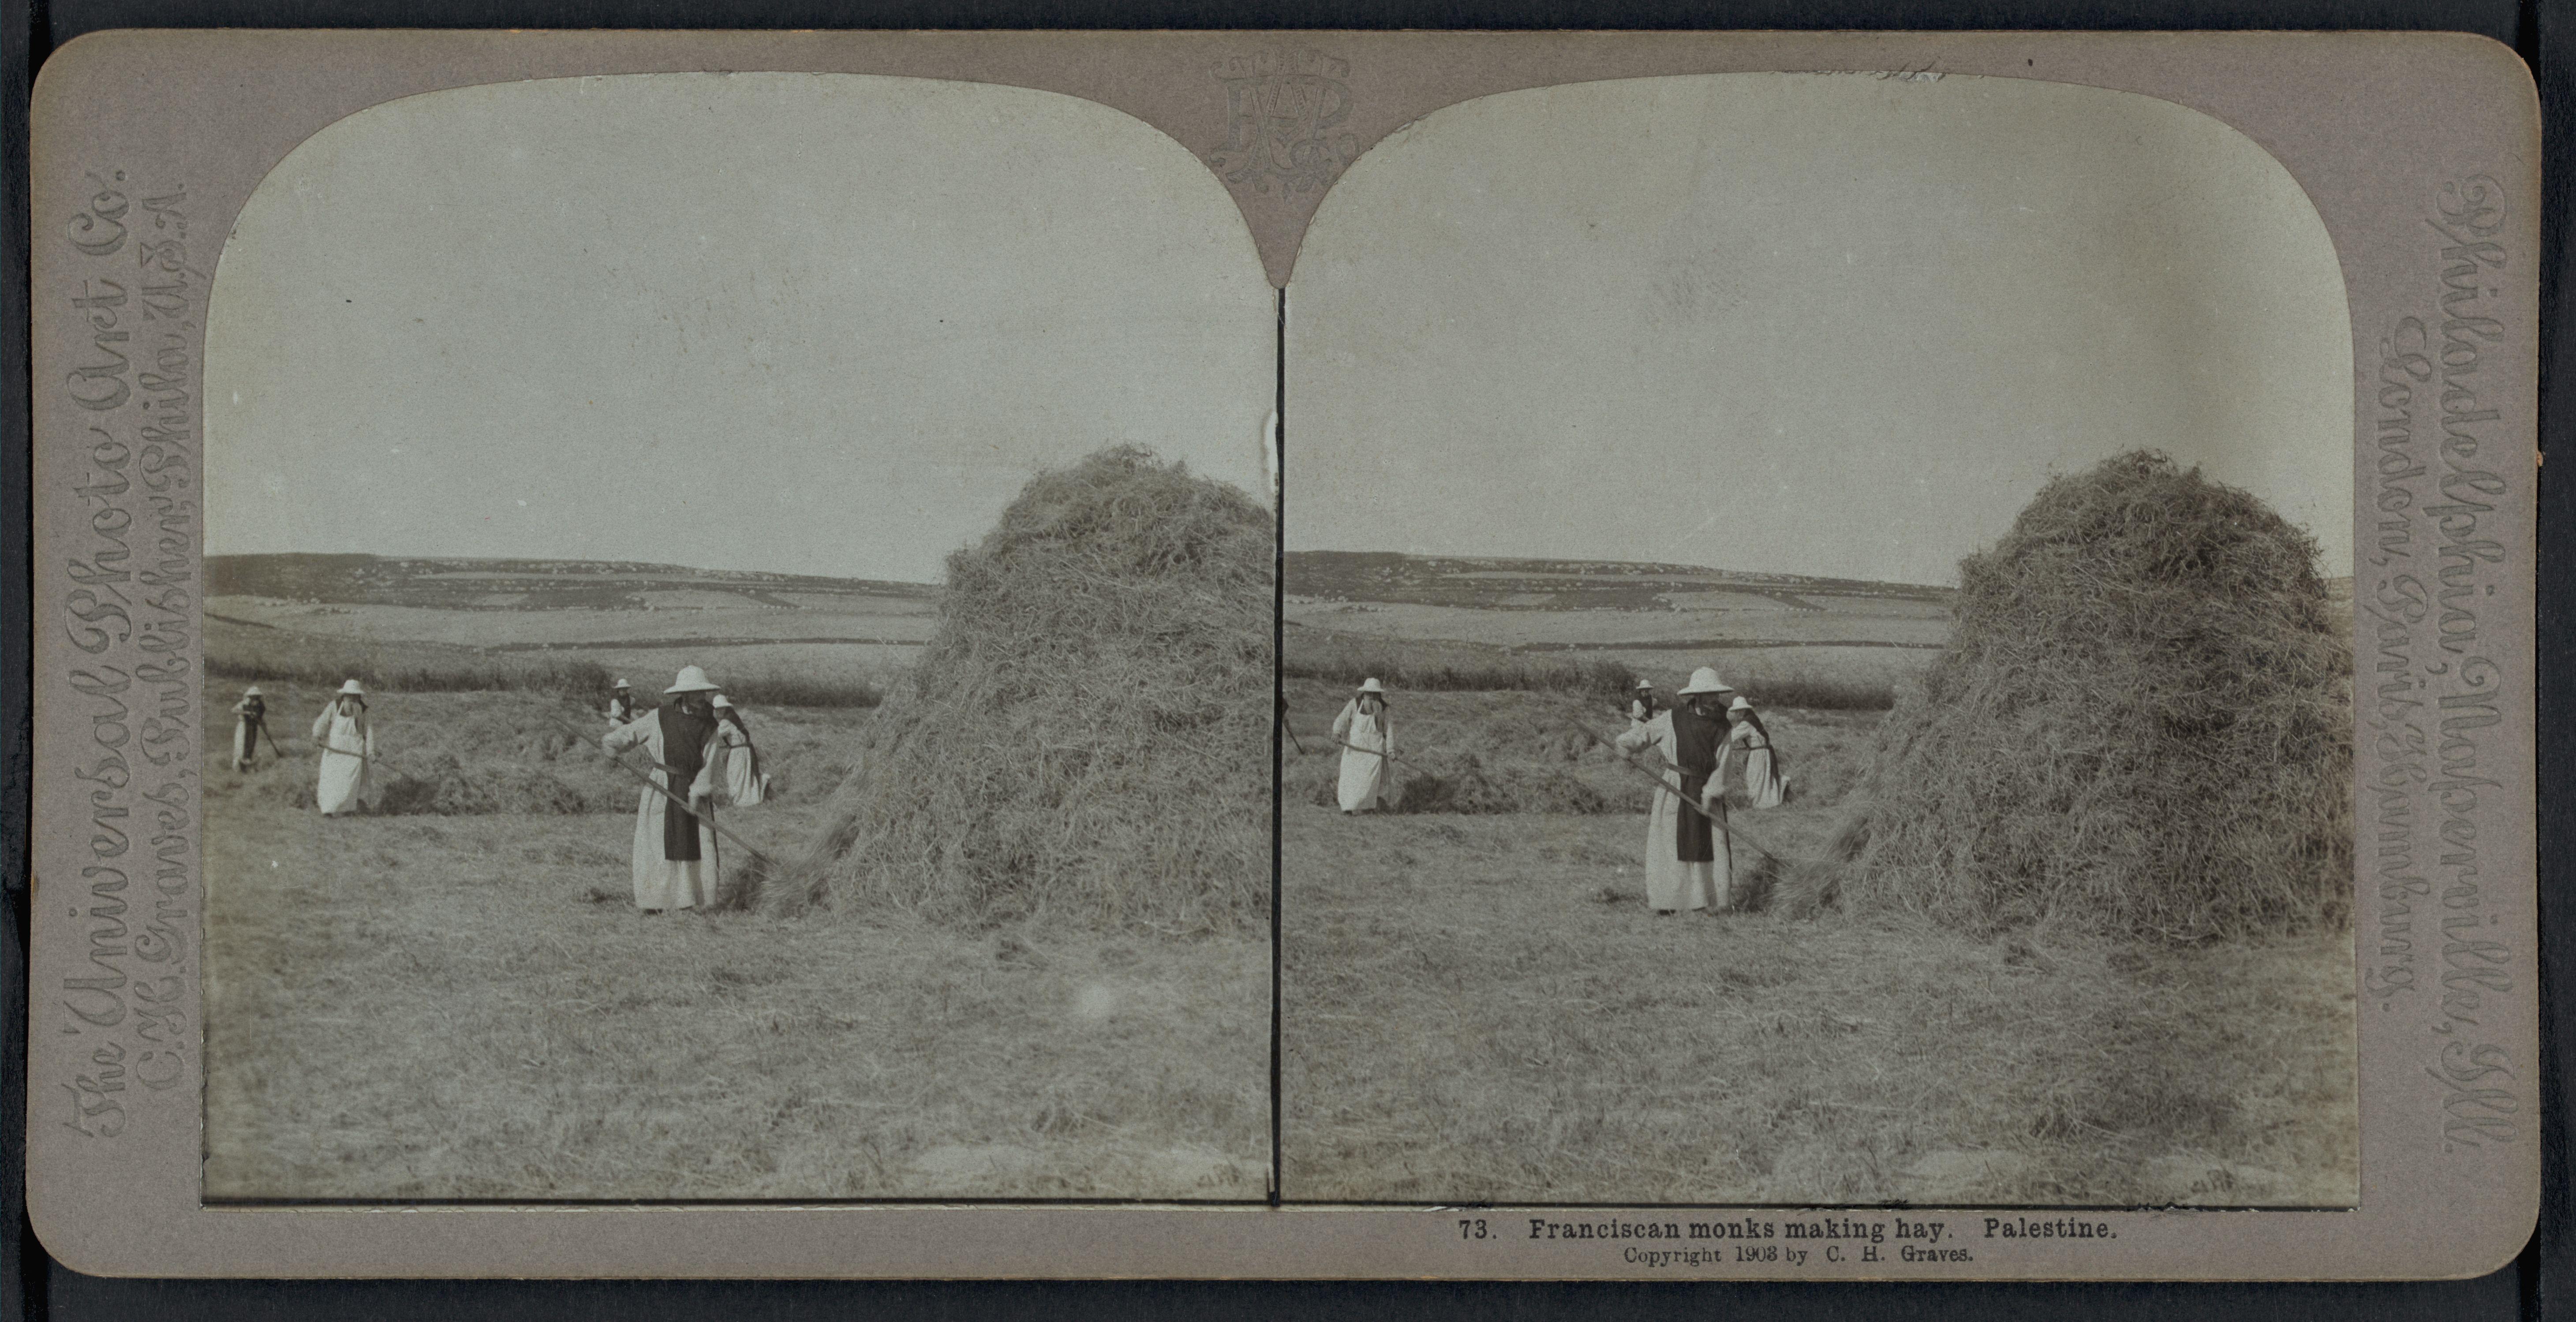 73. Монахи-францисканцы собирают сено